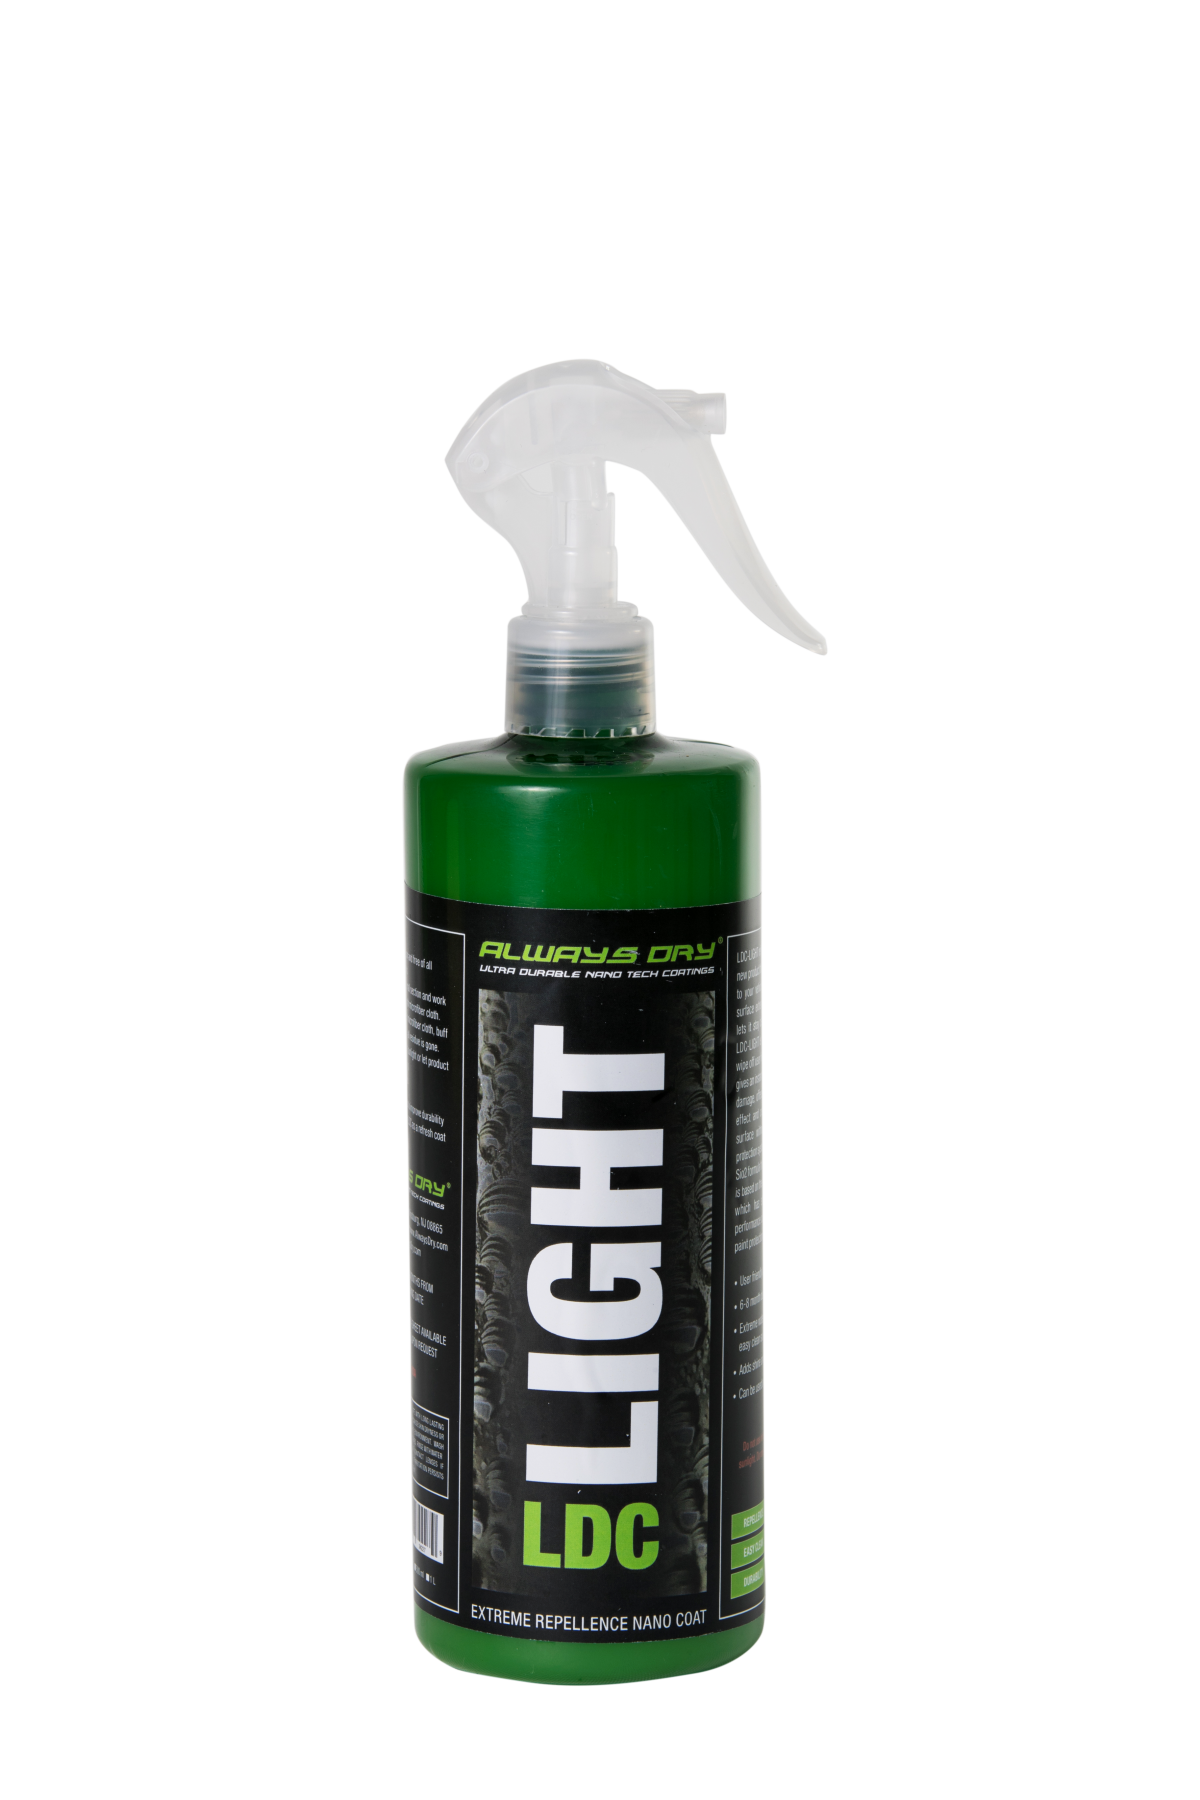 Always Dry LDC Light - Quick Detail Spray